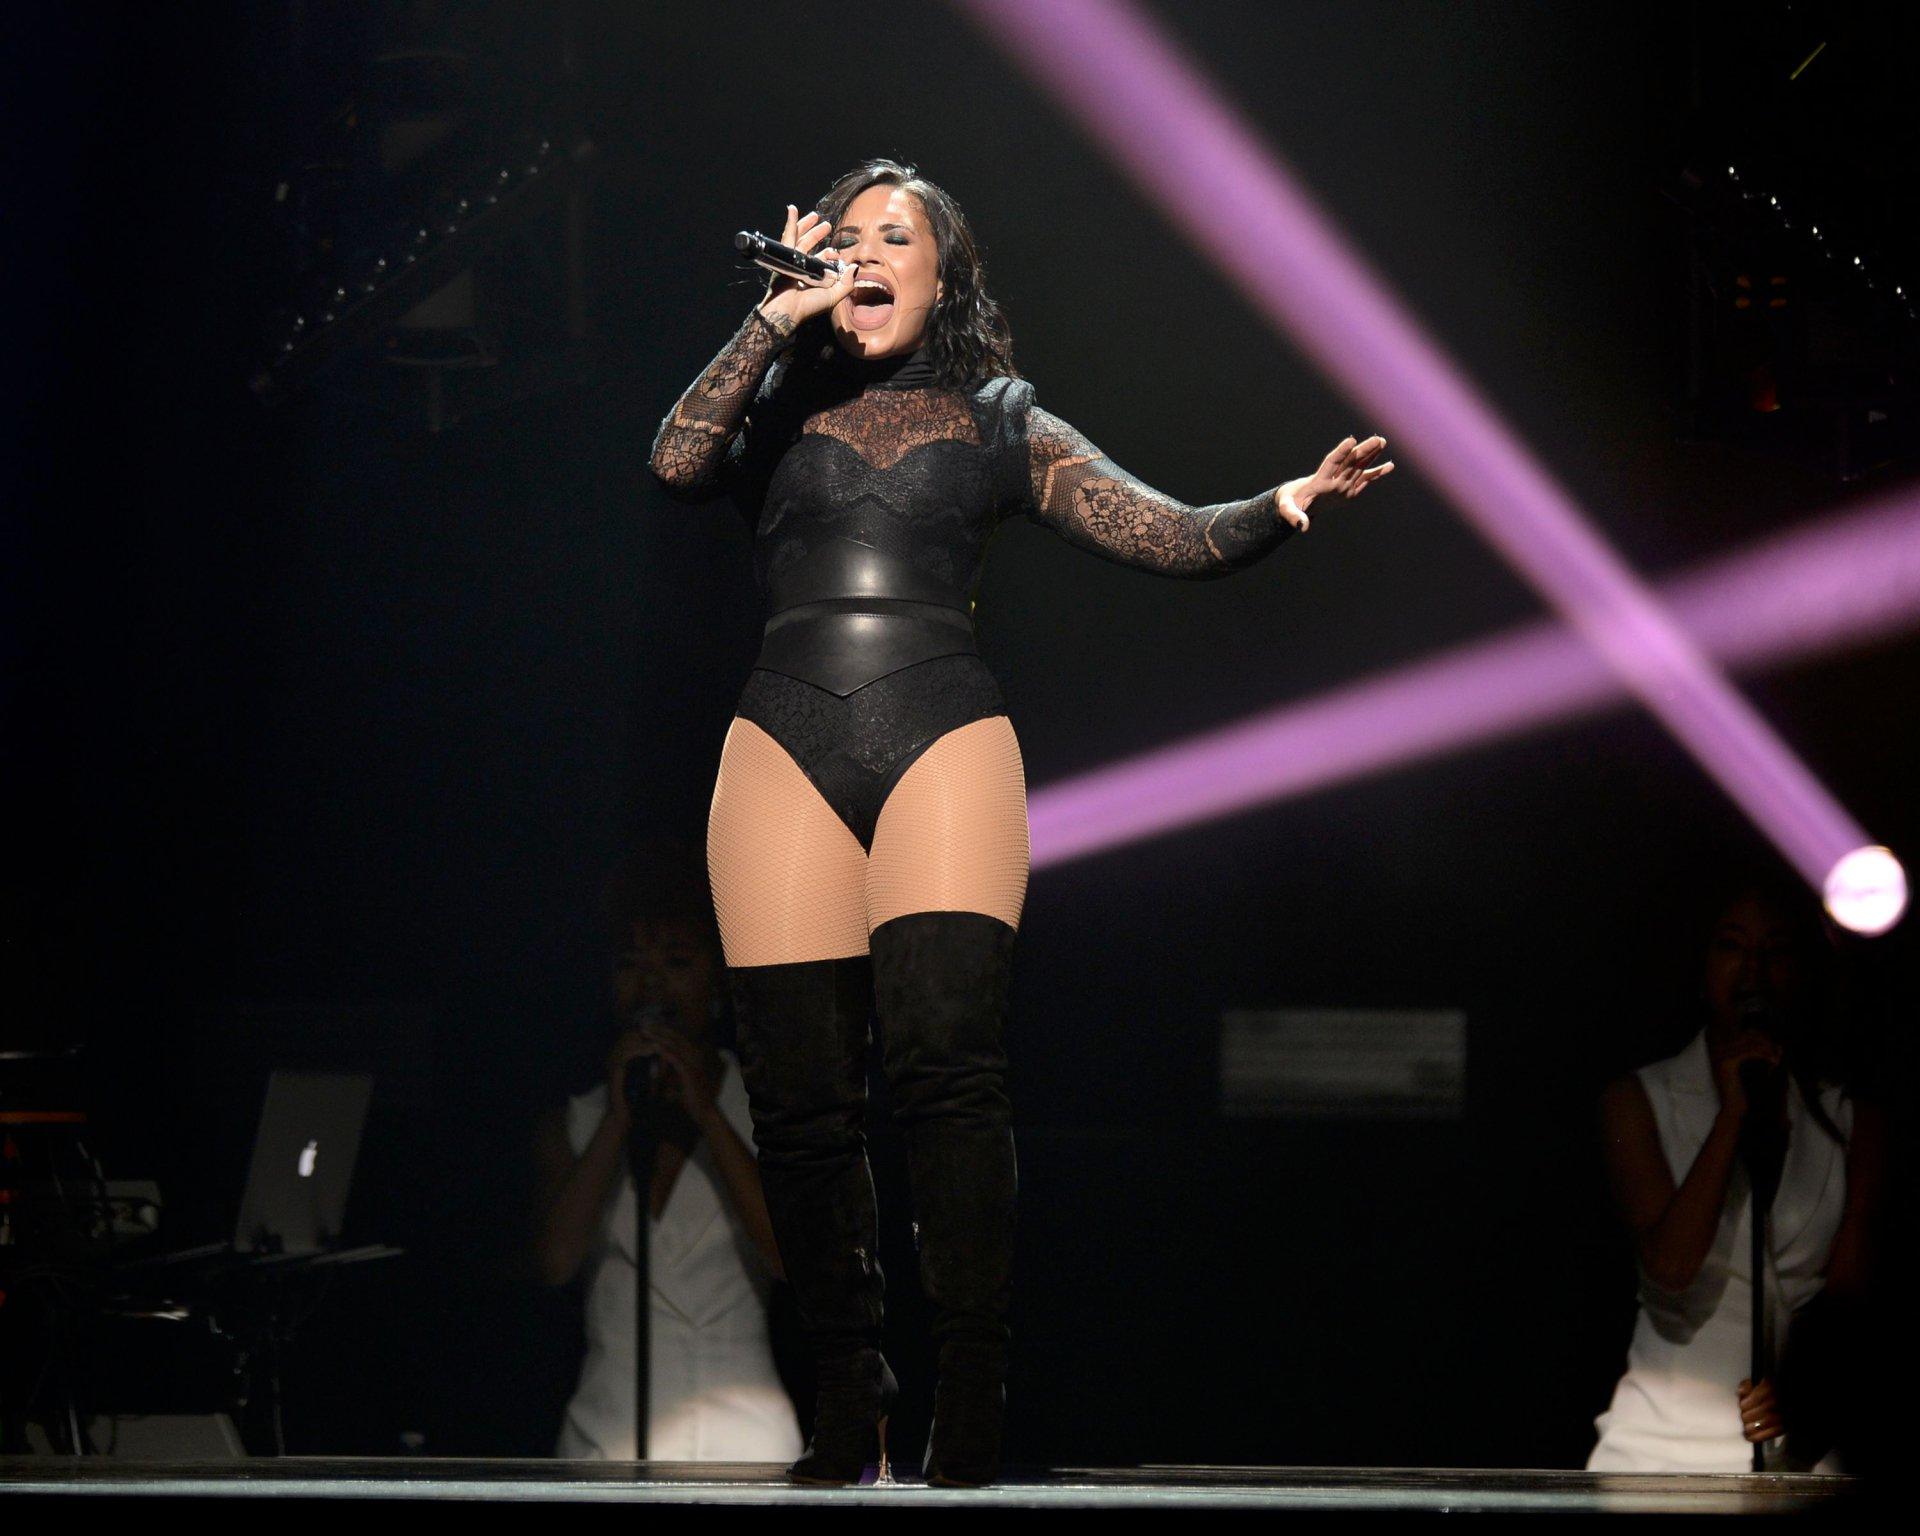 Demi Lovato 15 Hot Celebs Home